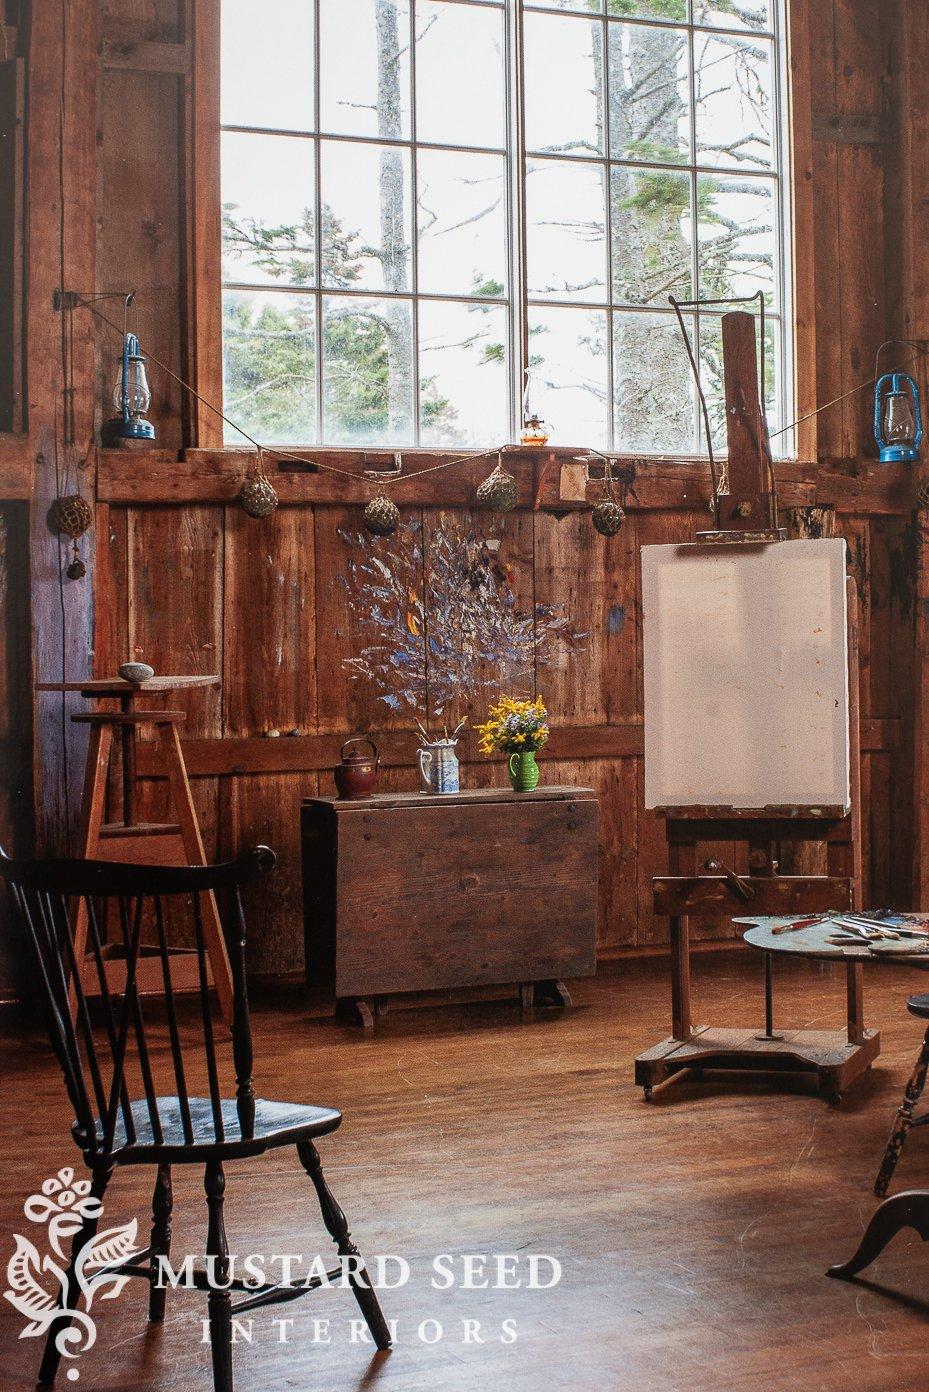 frank benson's studio | at first light | miss mustard seed